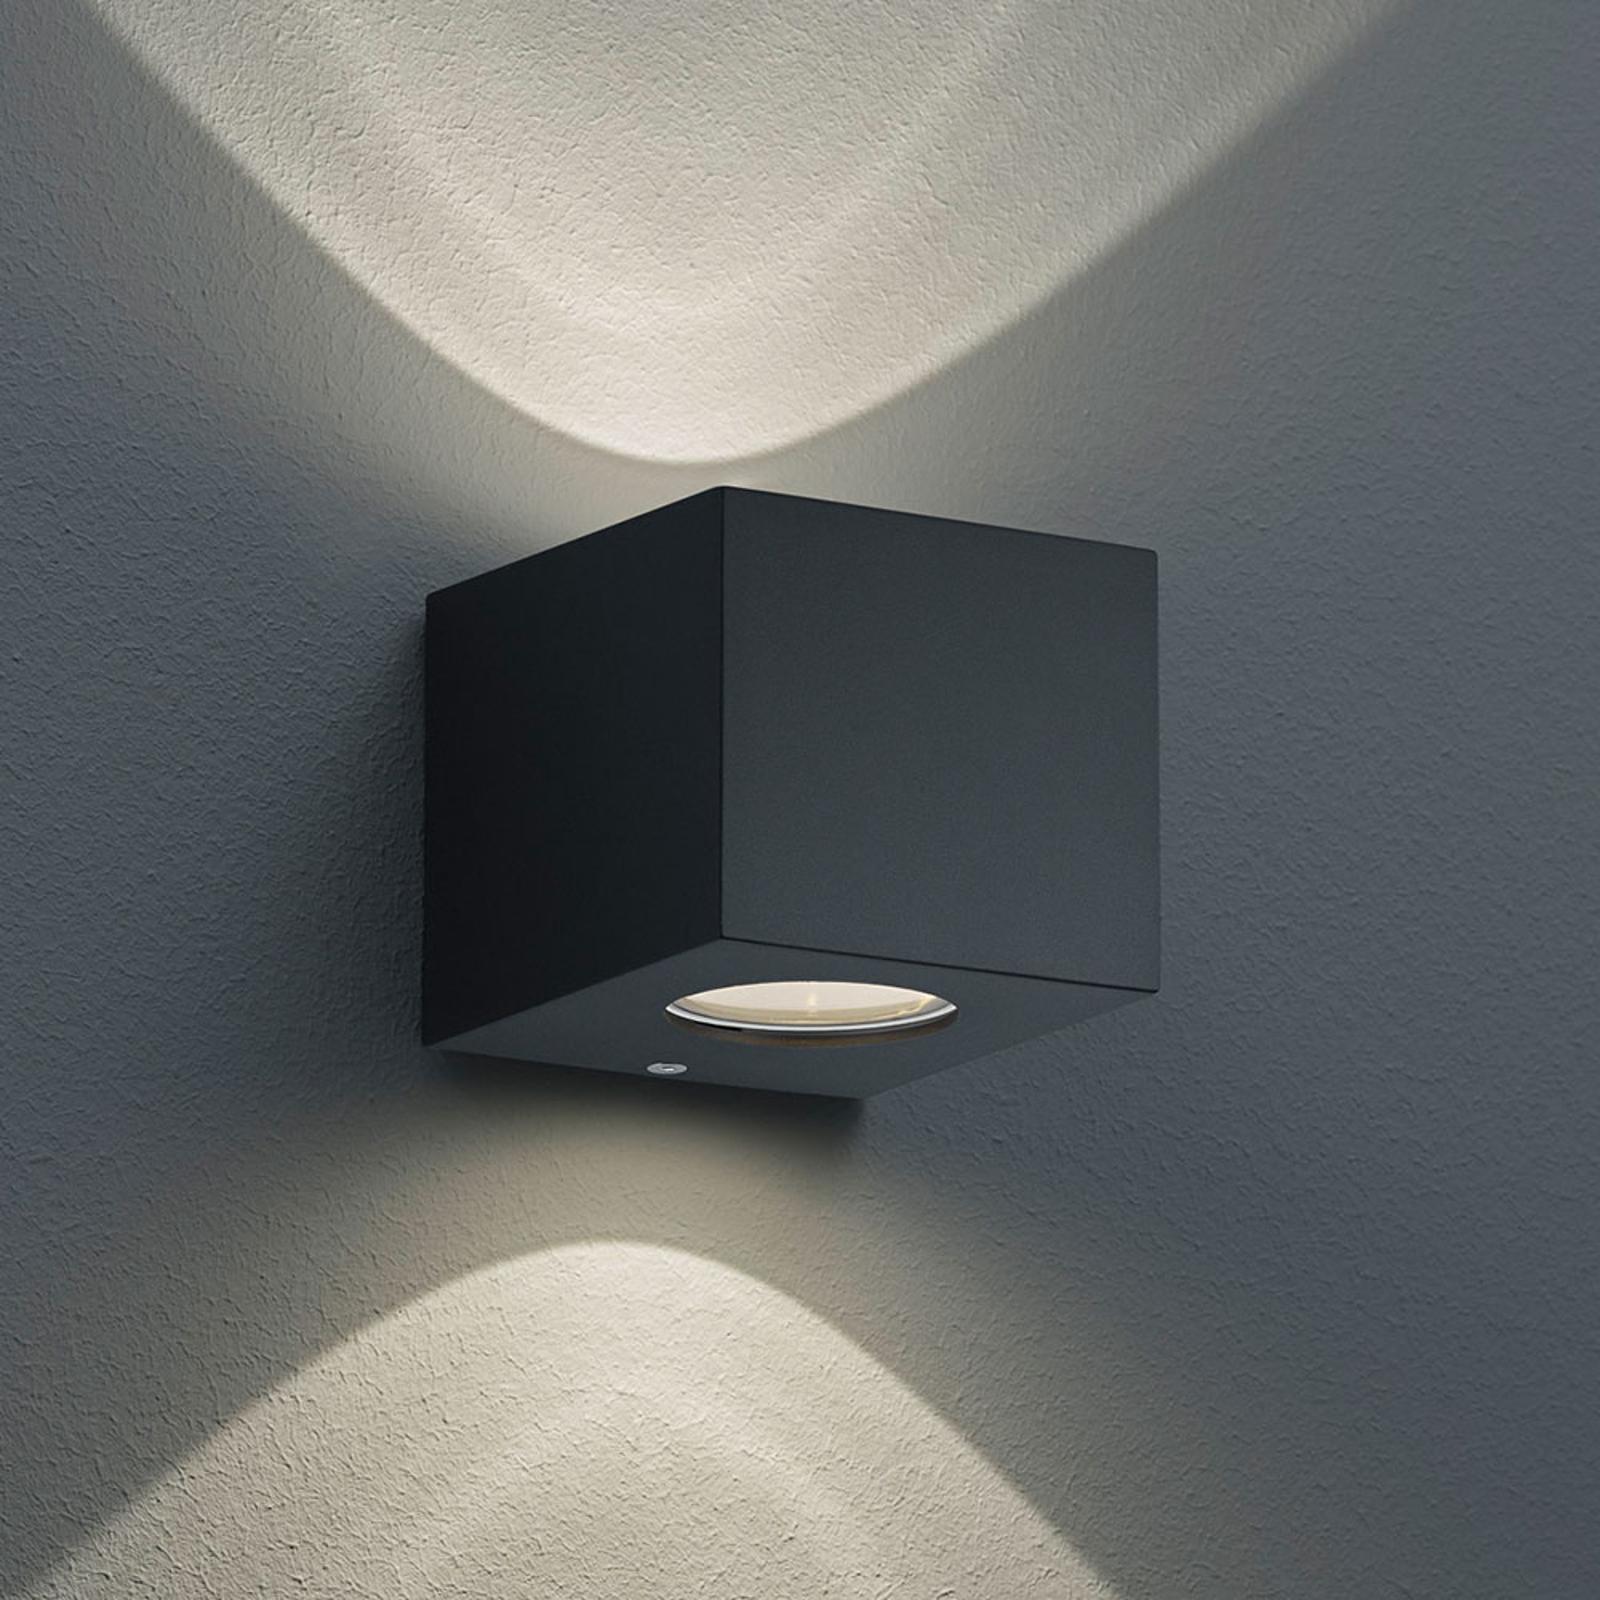 Eckige LED-Außenwandleuchte Cordoba, schwarz